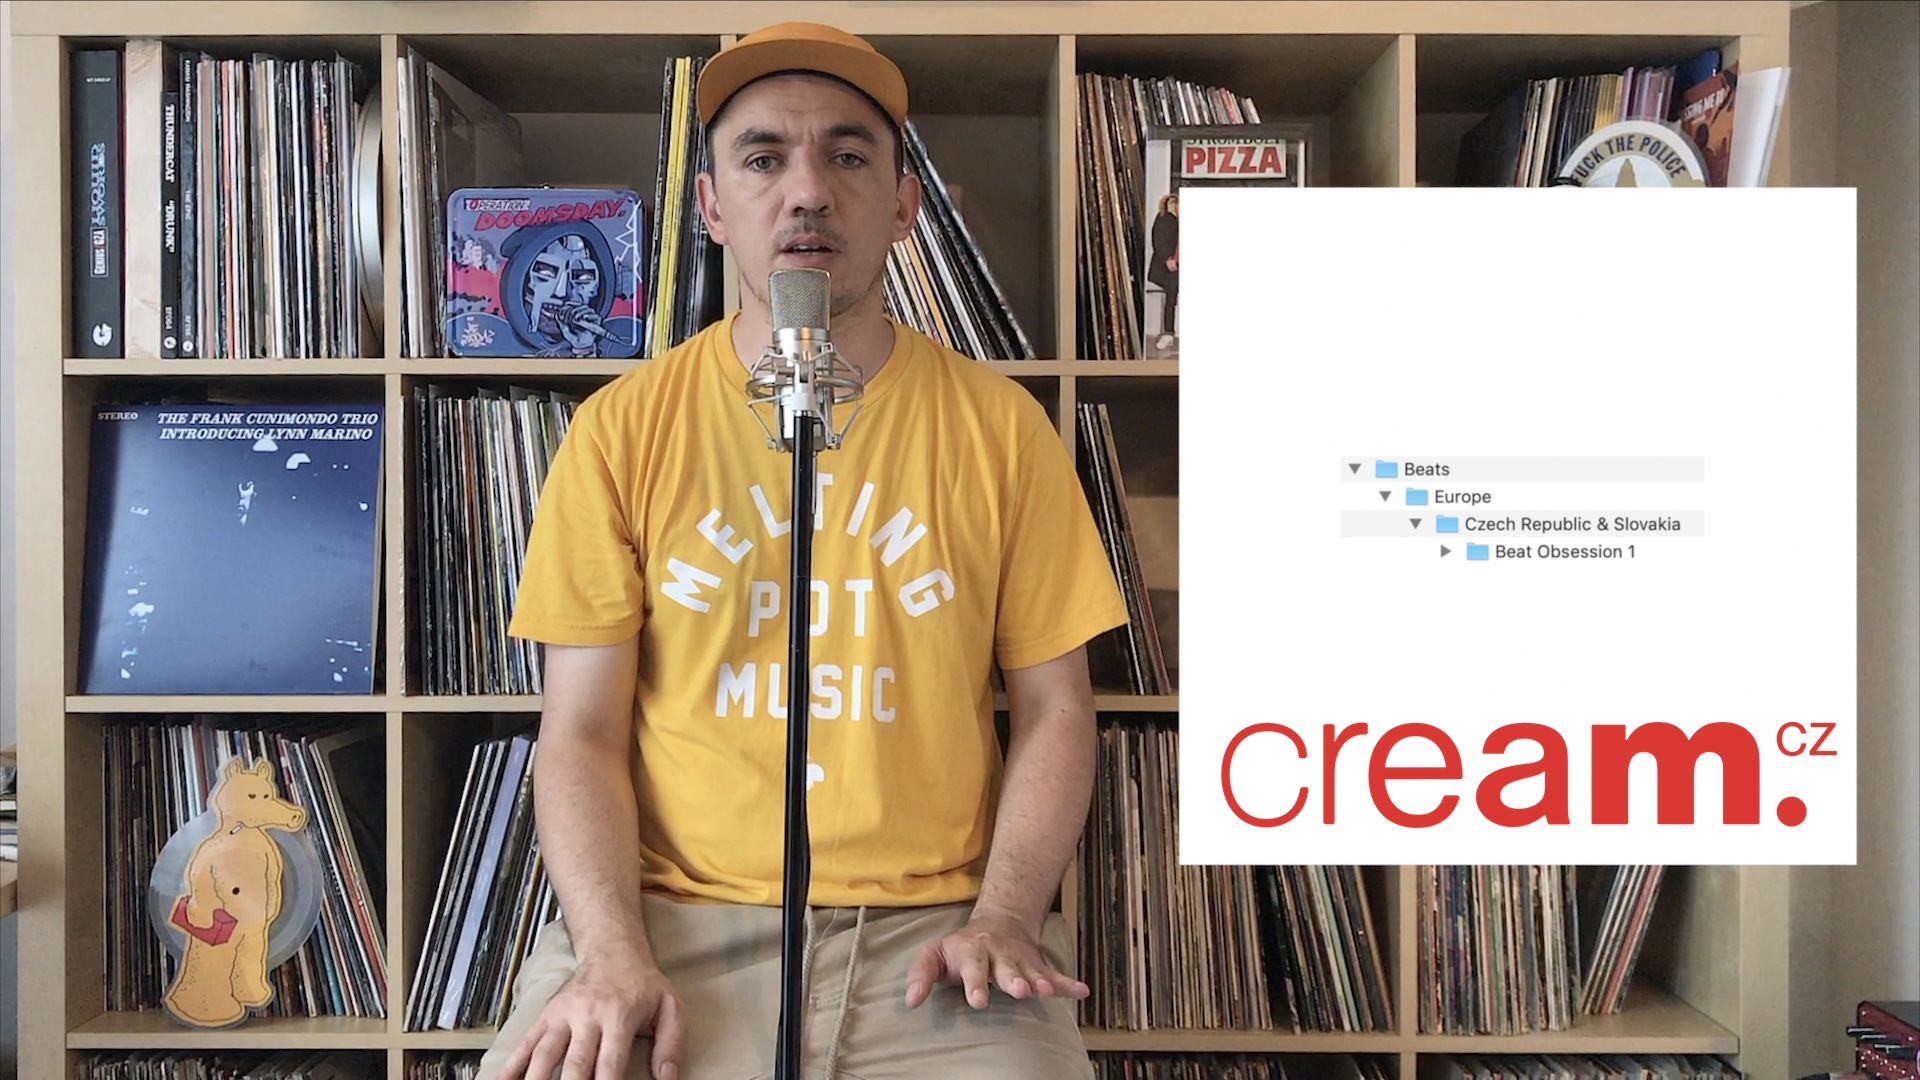 Vše o kompilaci Beat Obsession 1, DTonate, FOM a akci ajlavmjuzik [fjúžn] najt (VIDEO)